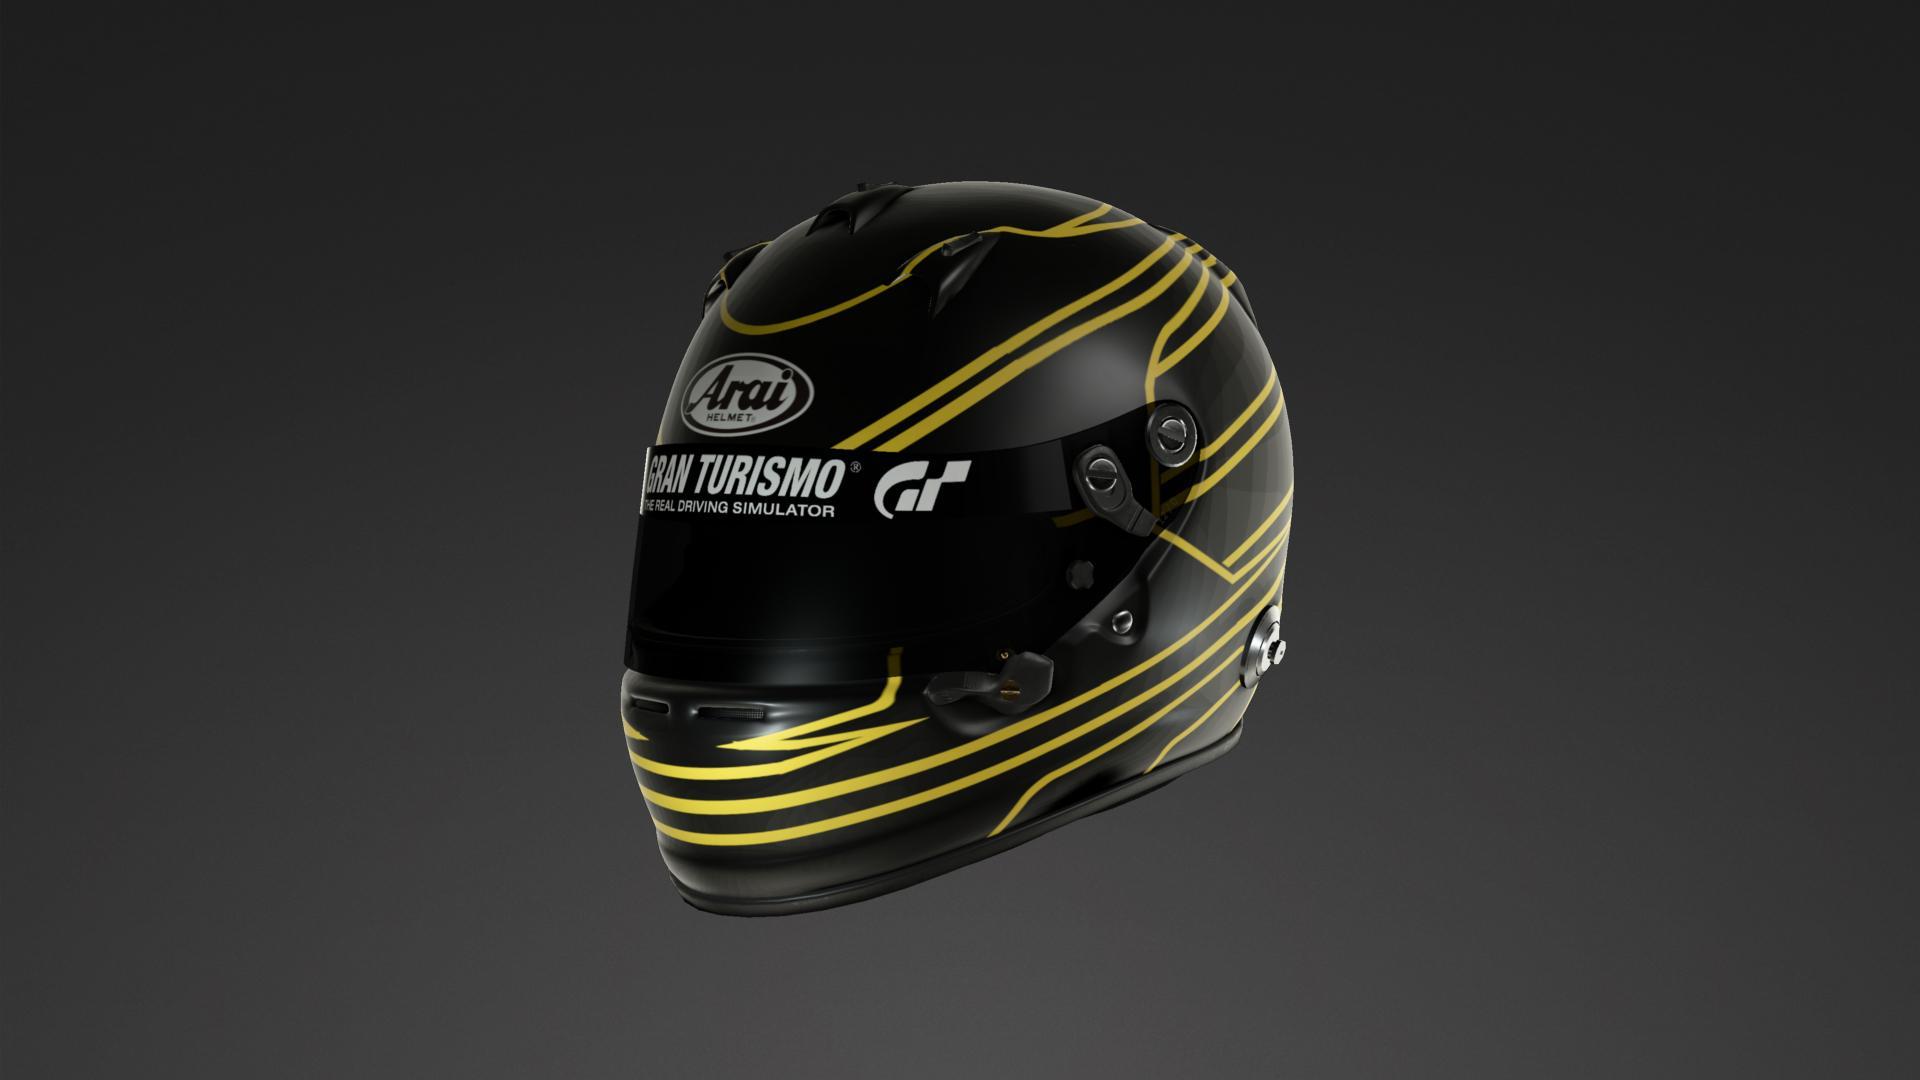 My Helmet 2 - Helmet Livery by tp-qb16   Community   Gran Turismo Sport